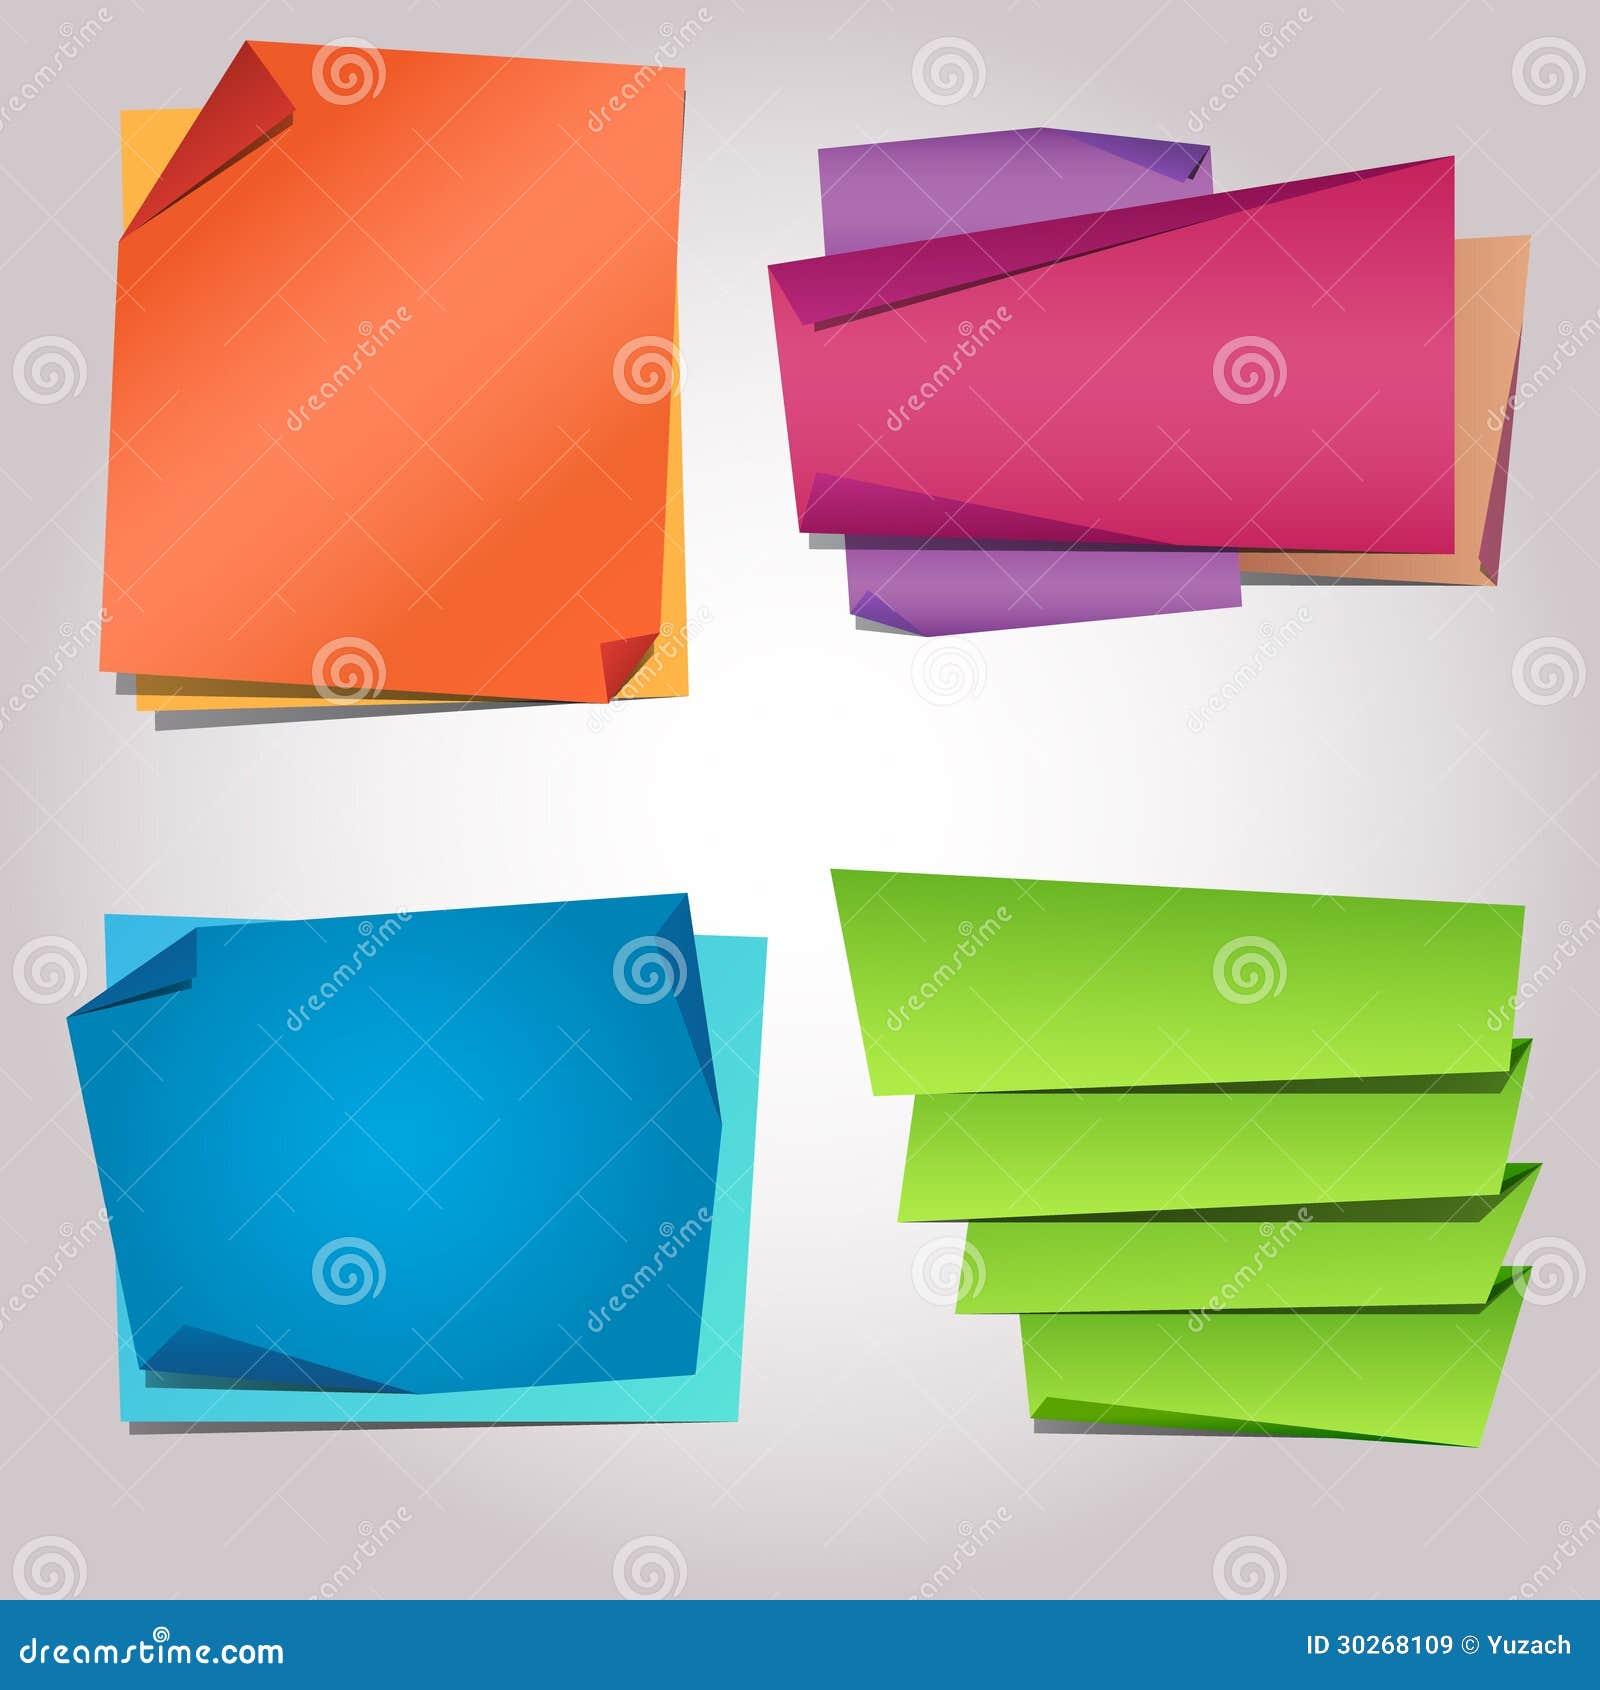 paper label sticker templates .